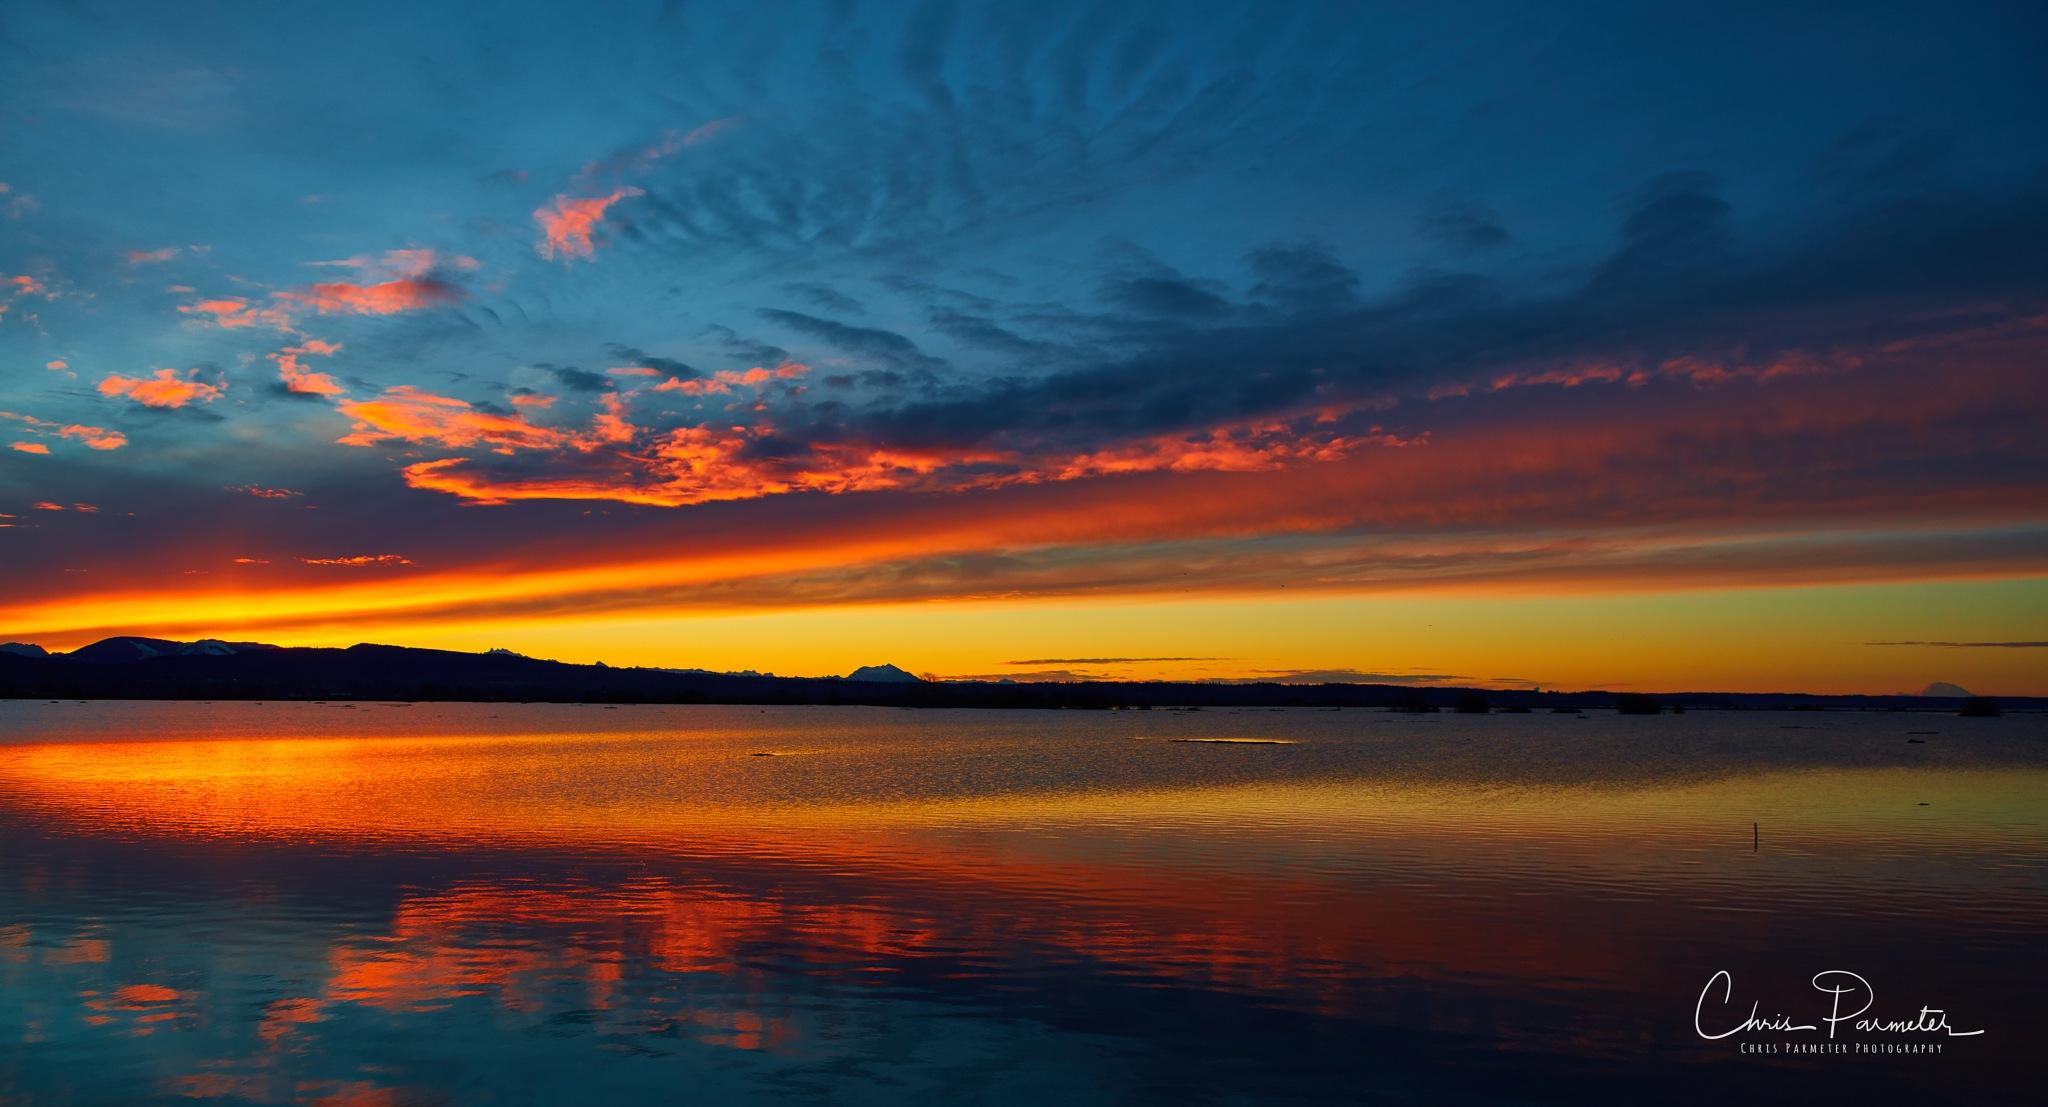 Sunrise on Skagit Bay by Wet Dog Studios